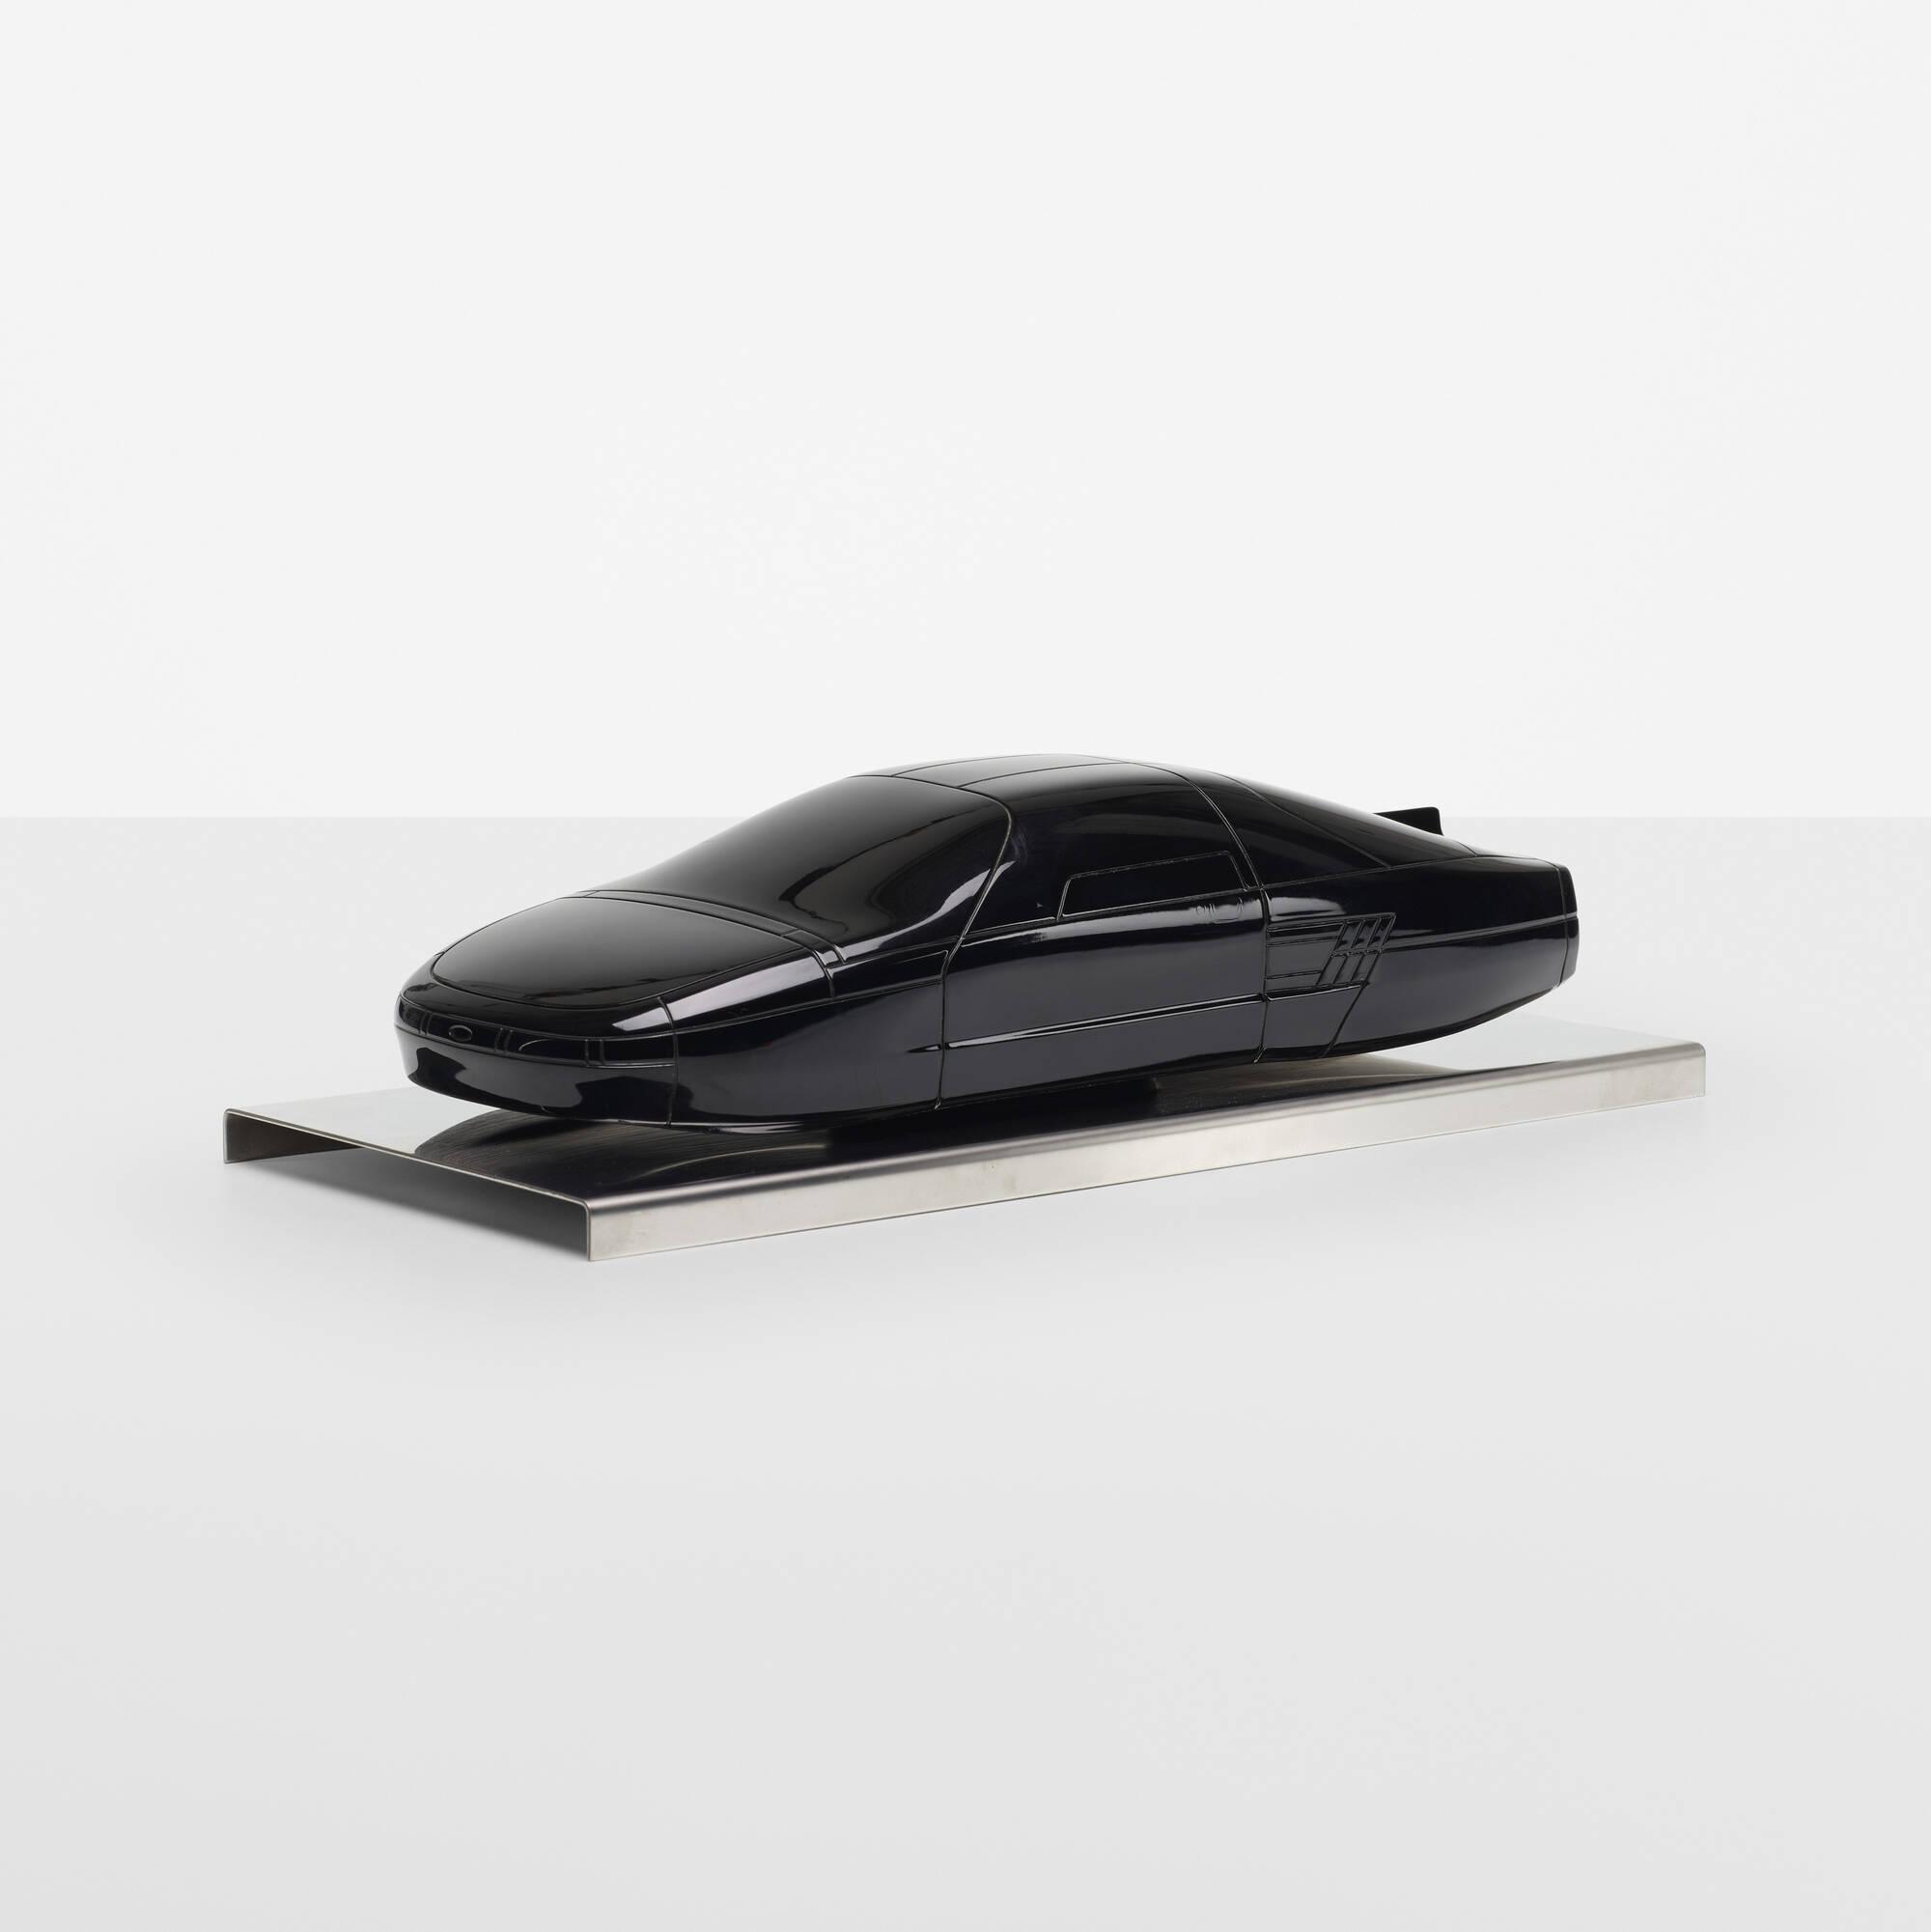 459 Claude Lobo For Ford Probe V Concept Car Model 1 Of 2